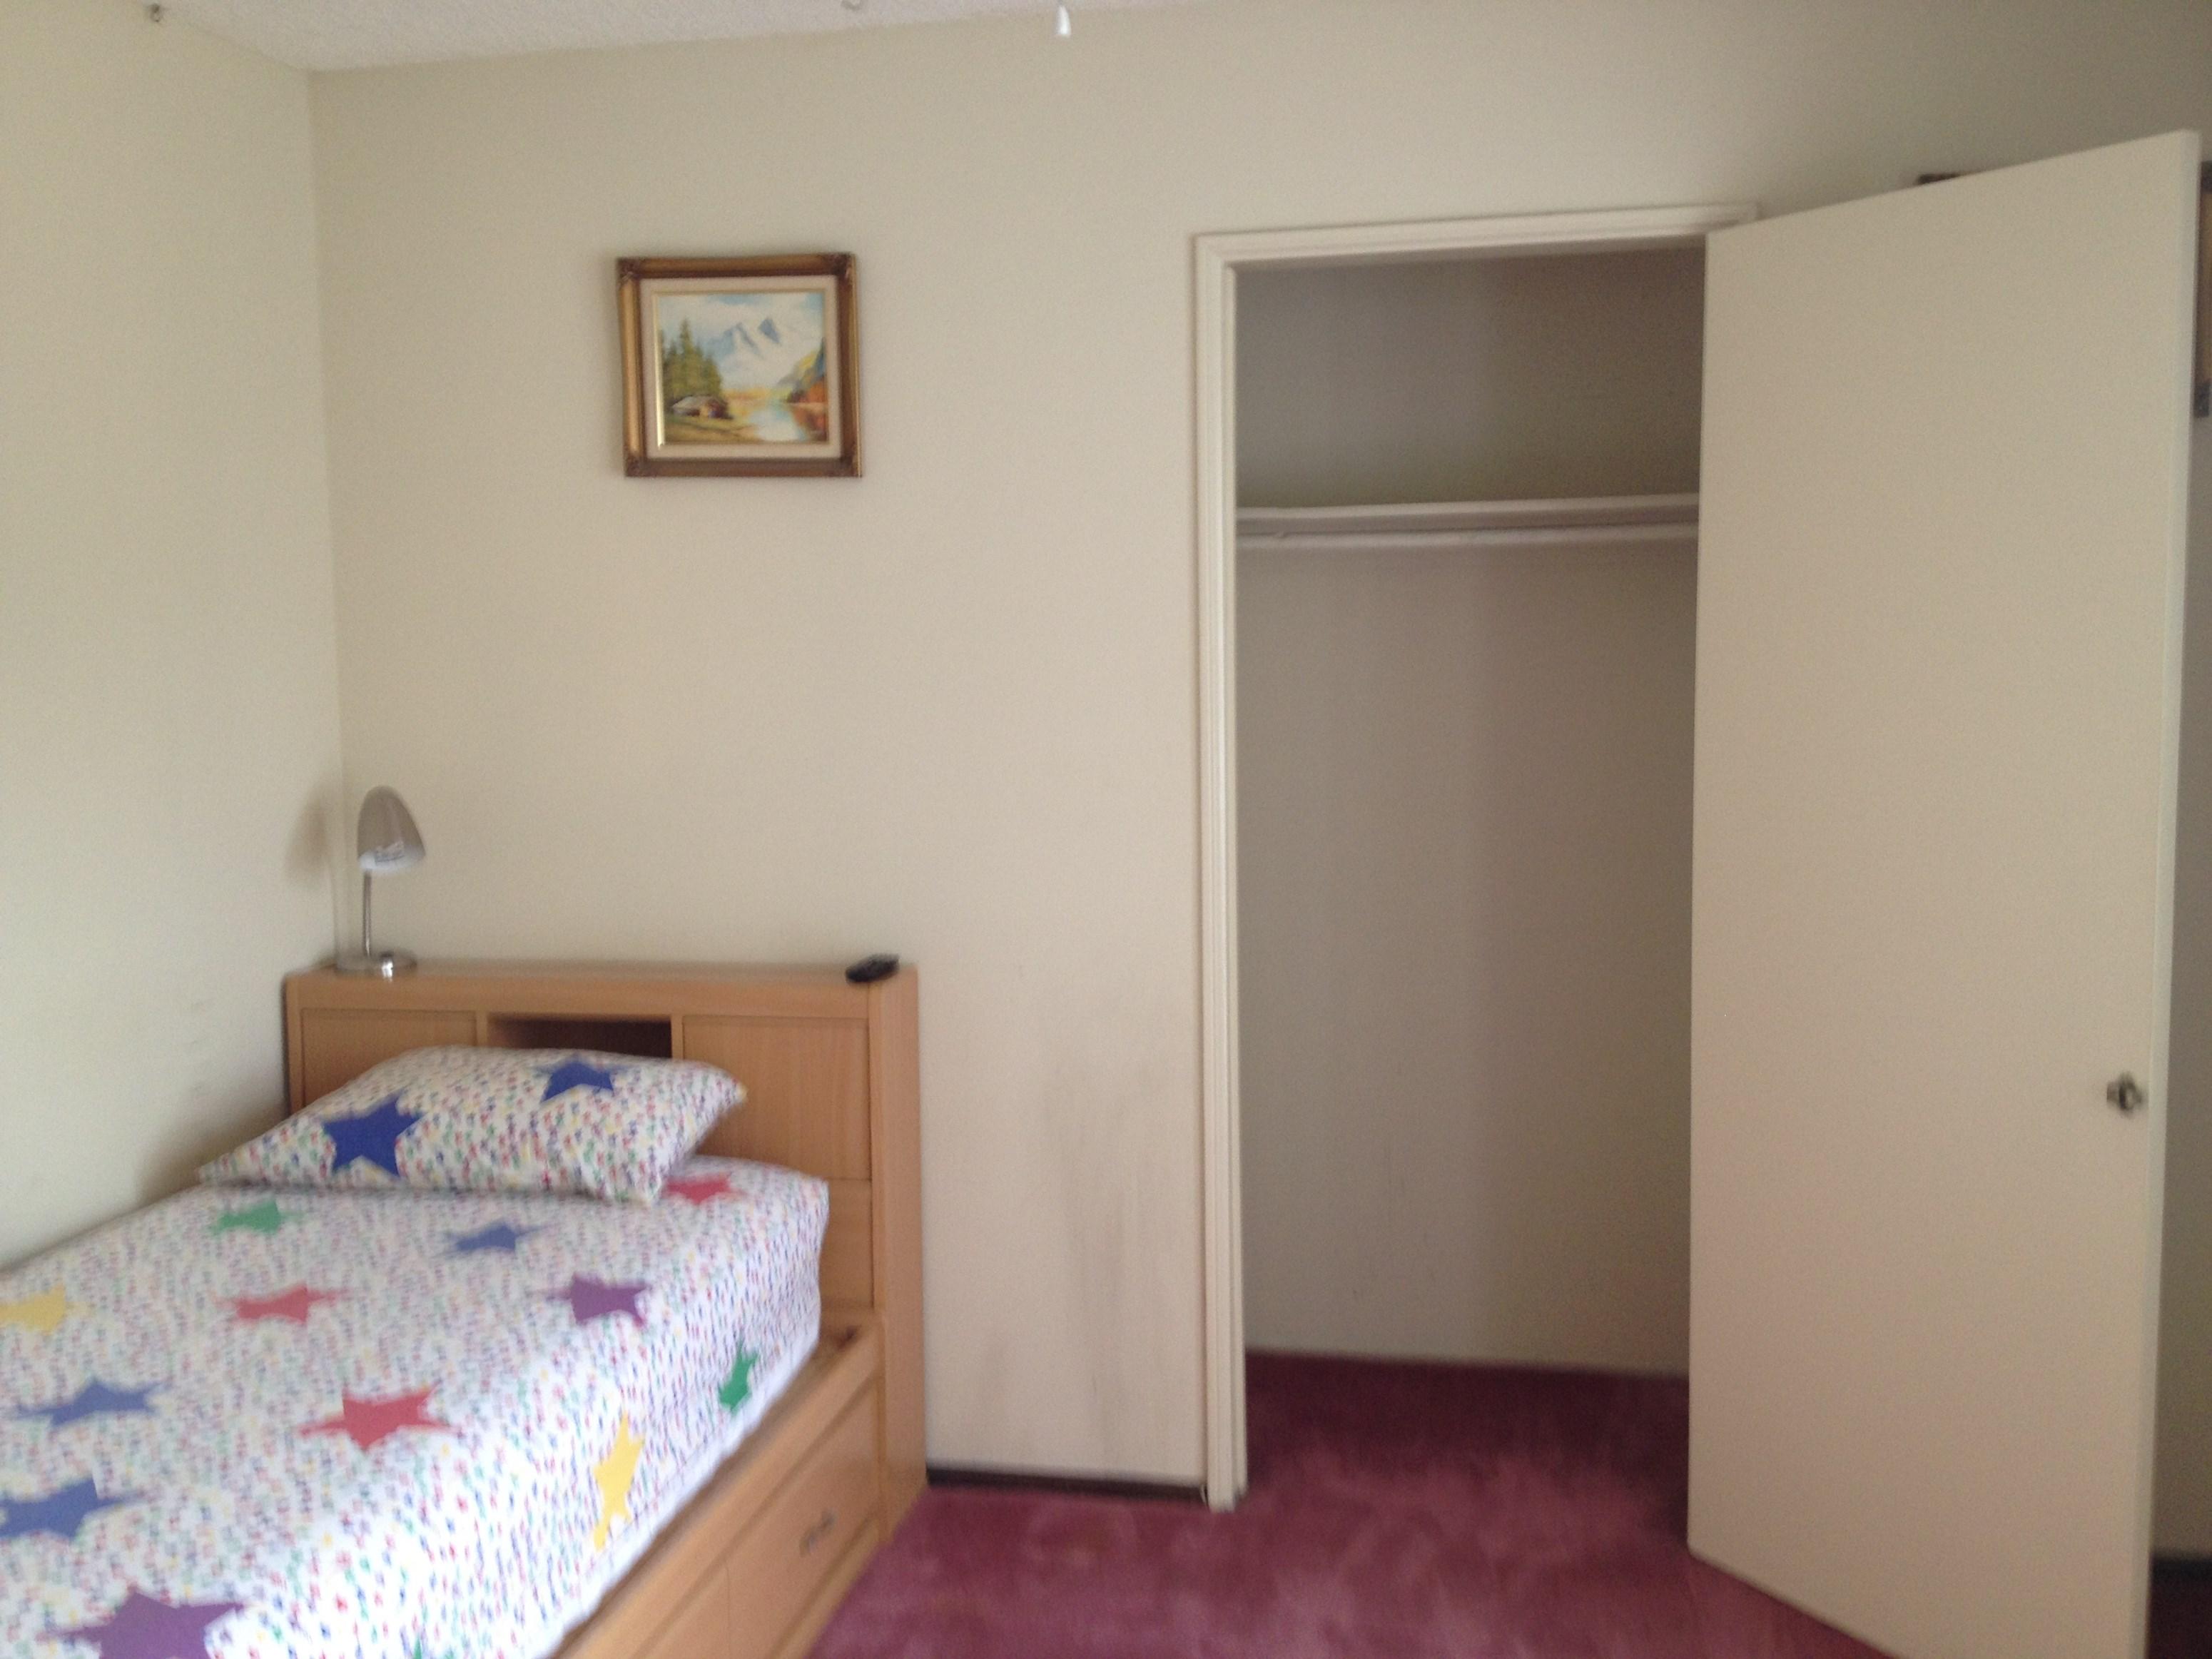 Fully Furnish Room Near Irvine, California In Santa Ana Ca